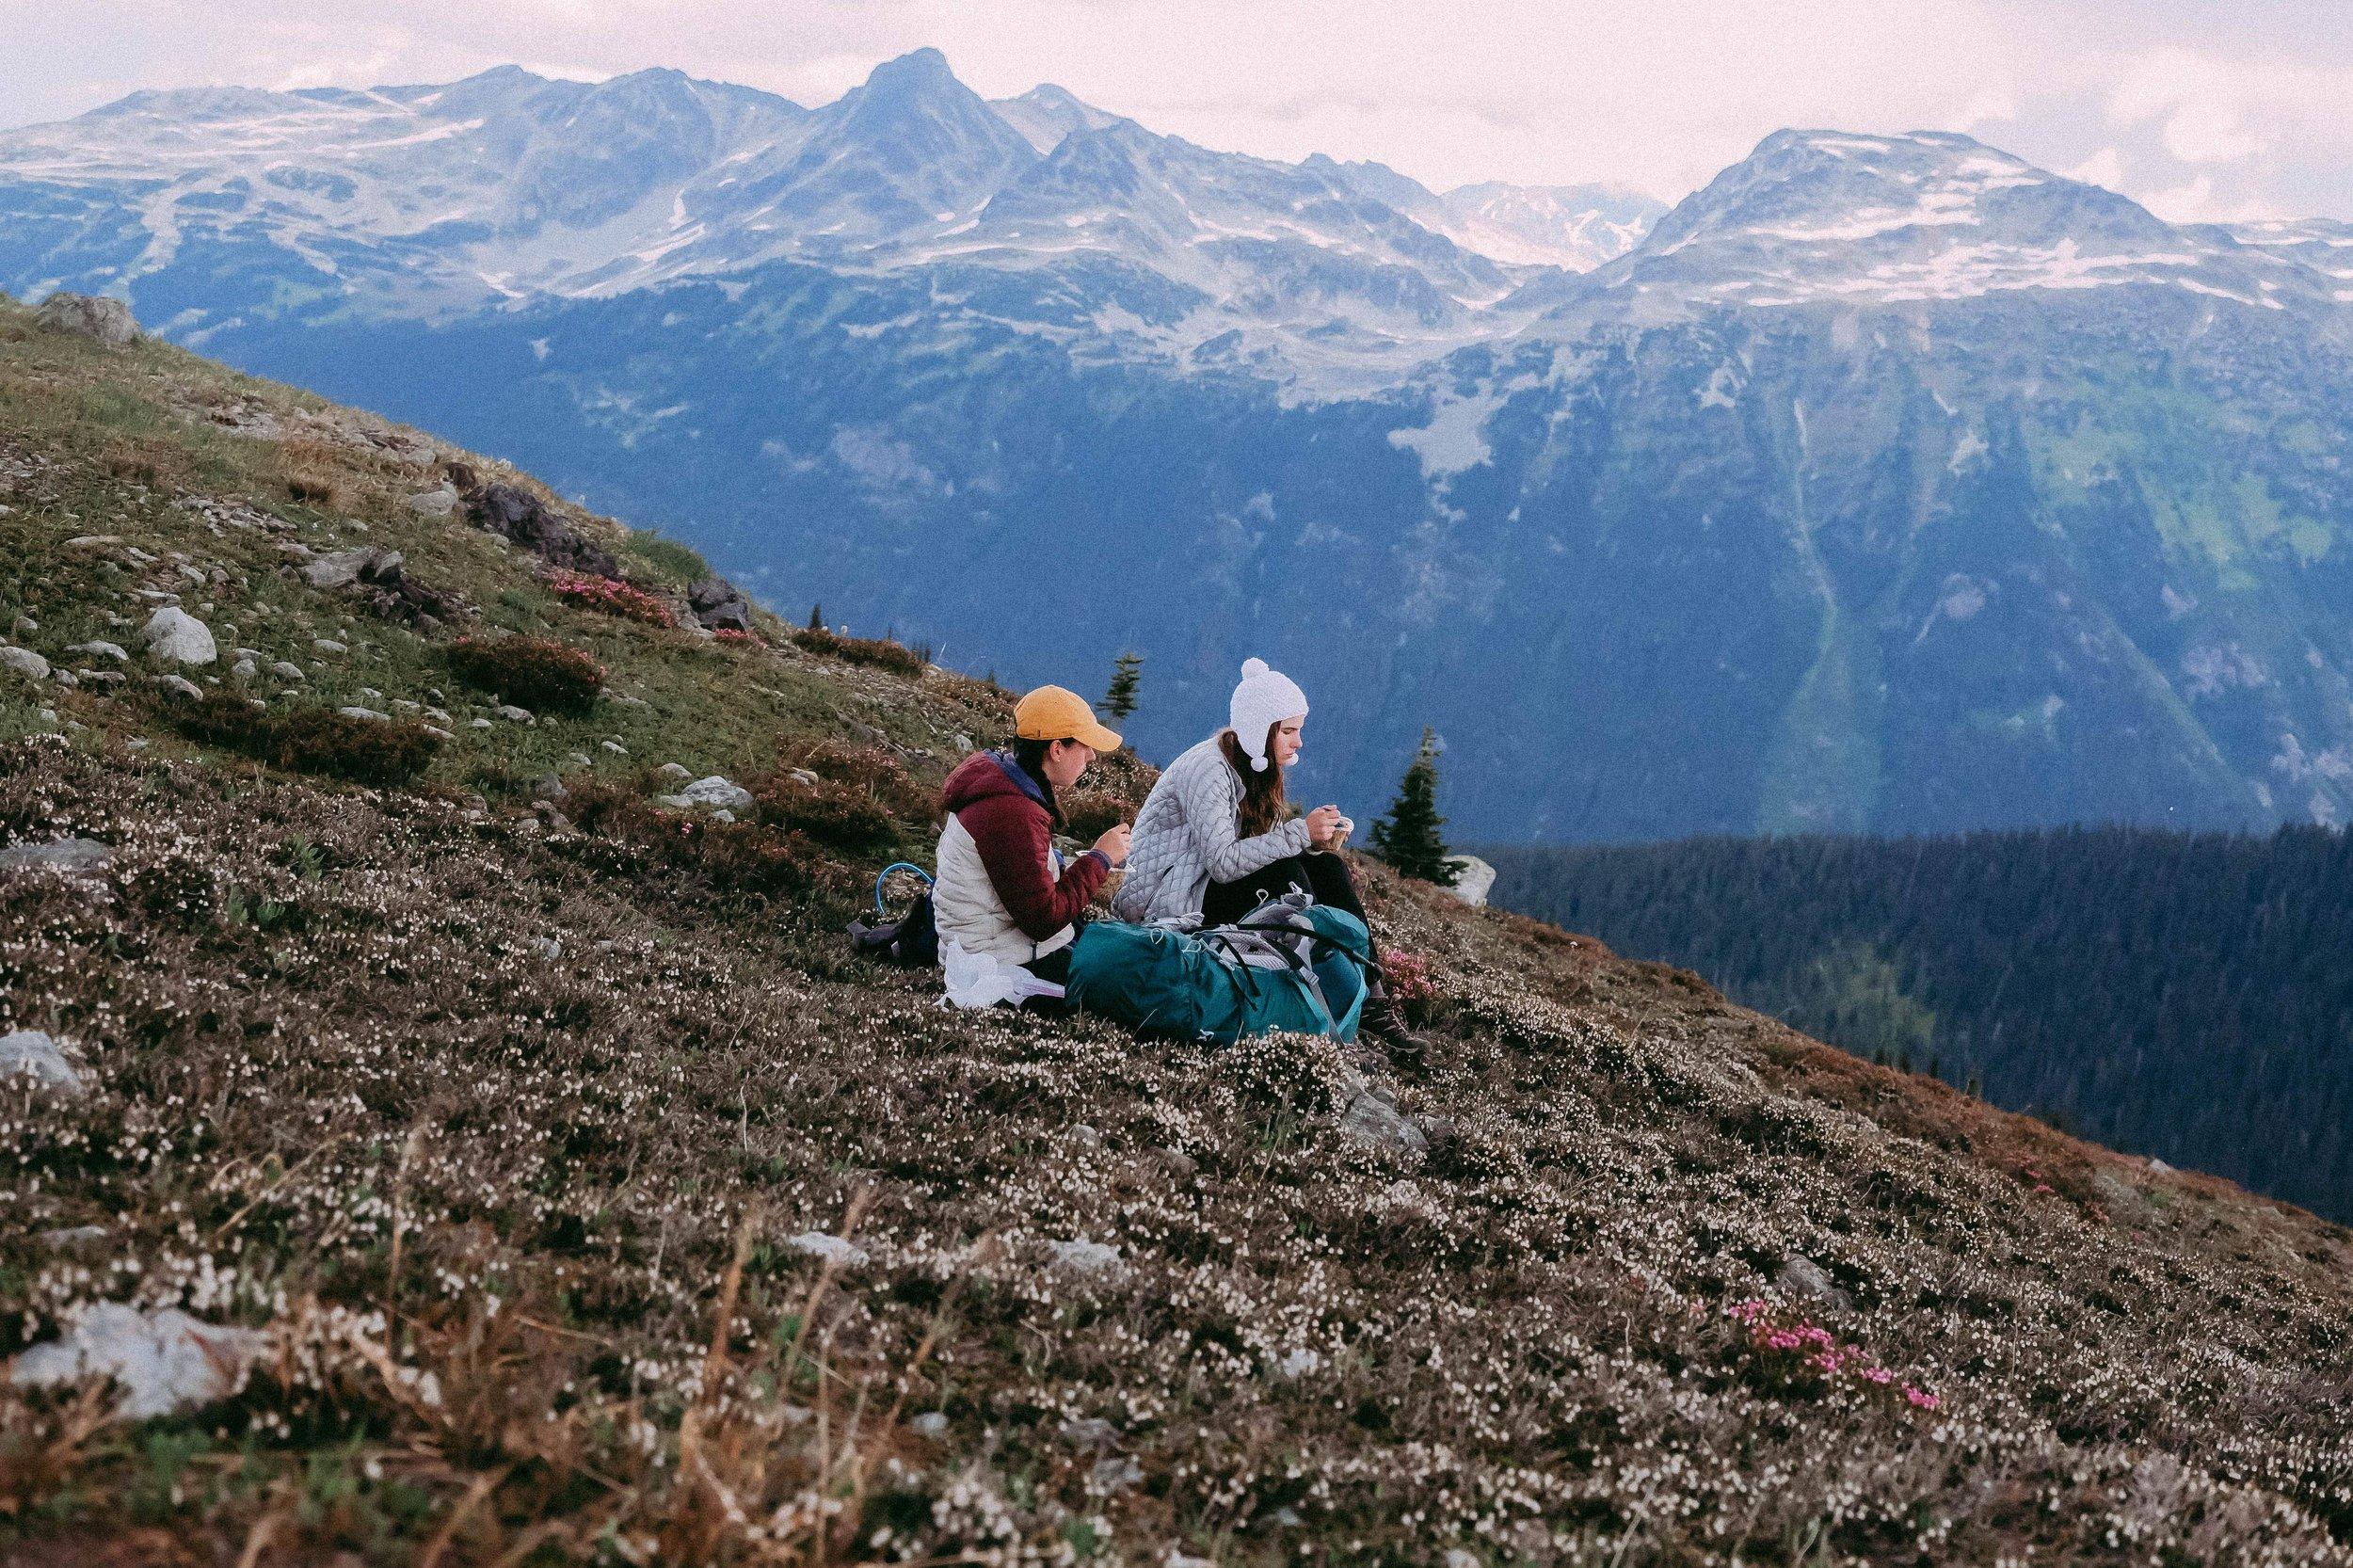 Menschen-Berge-Natur.jpg